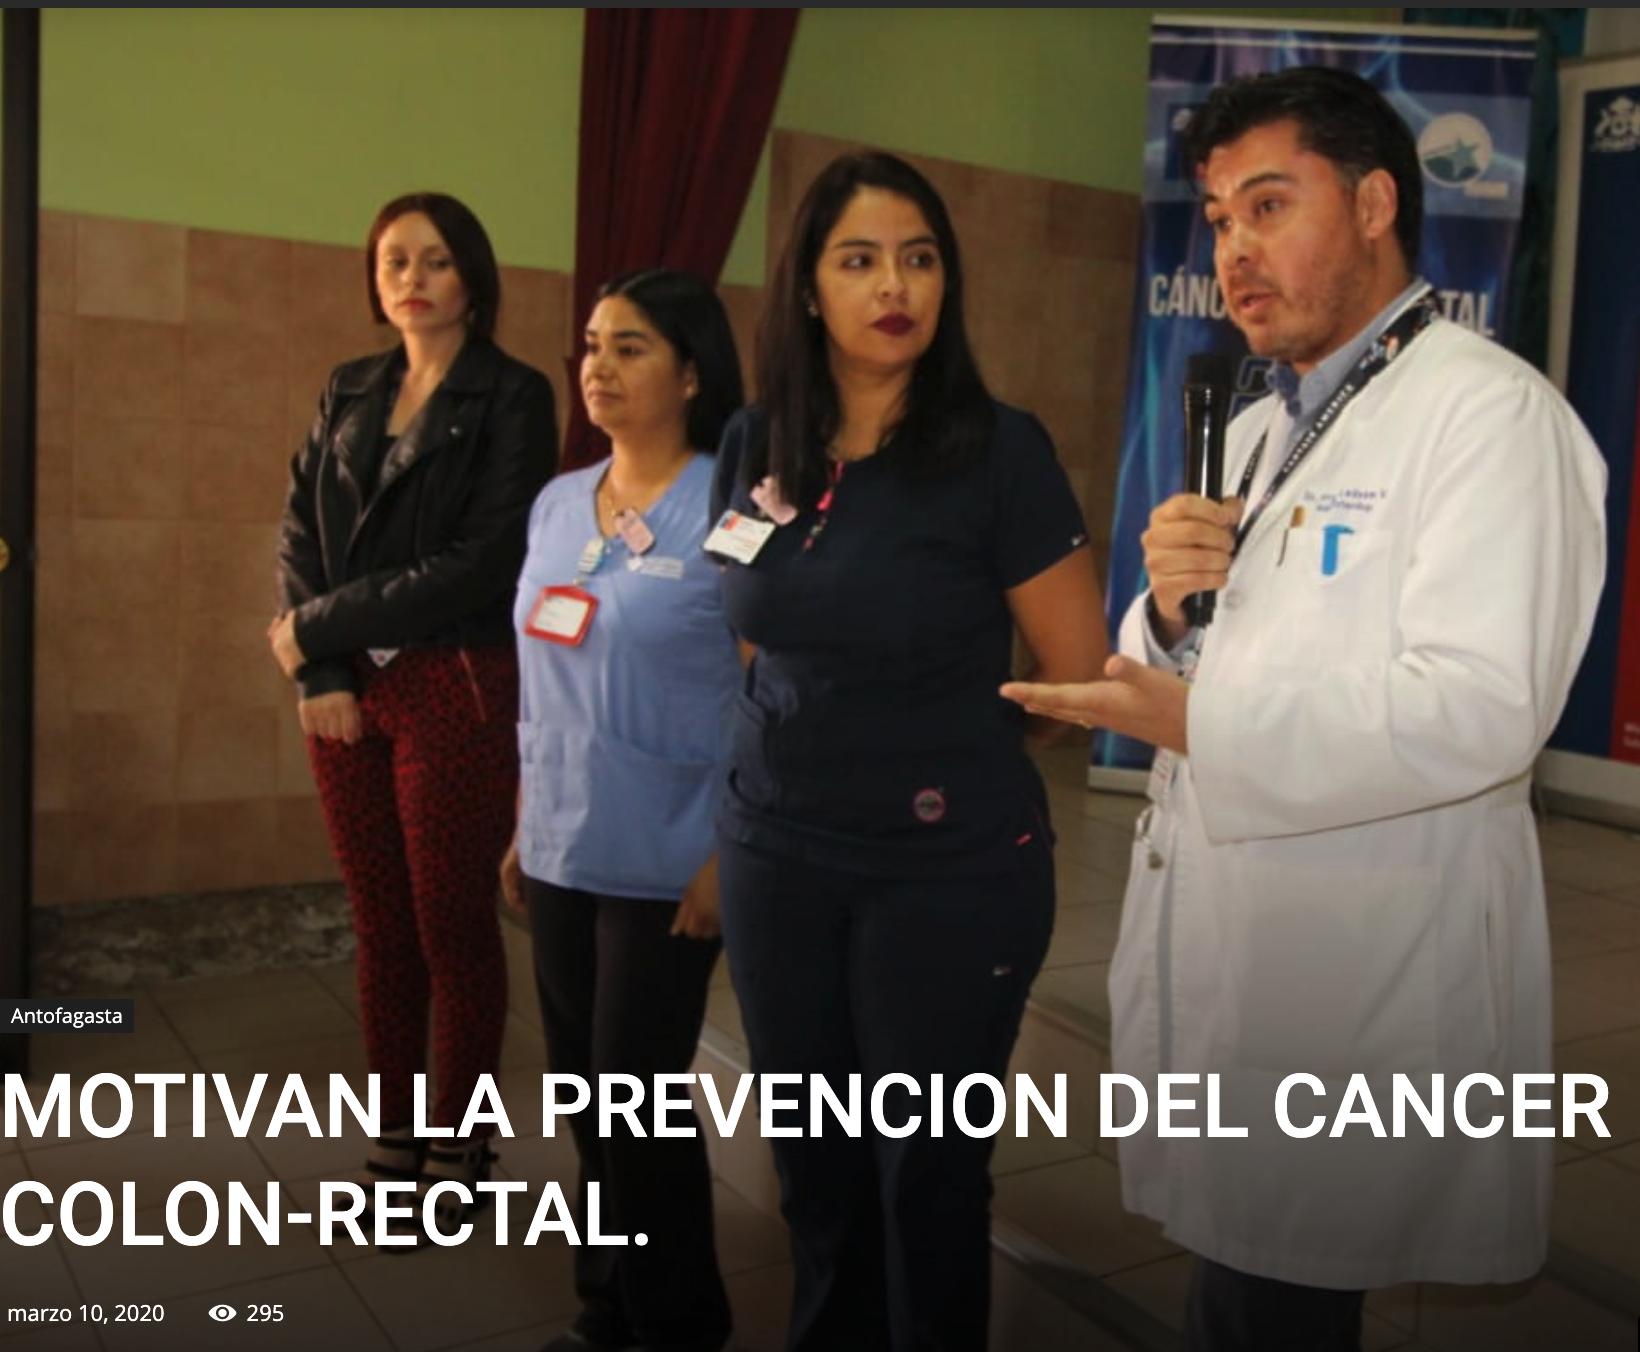 MOTIVAN LA PREVENCION DEL CANCER COLON-RECTAL.